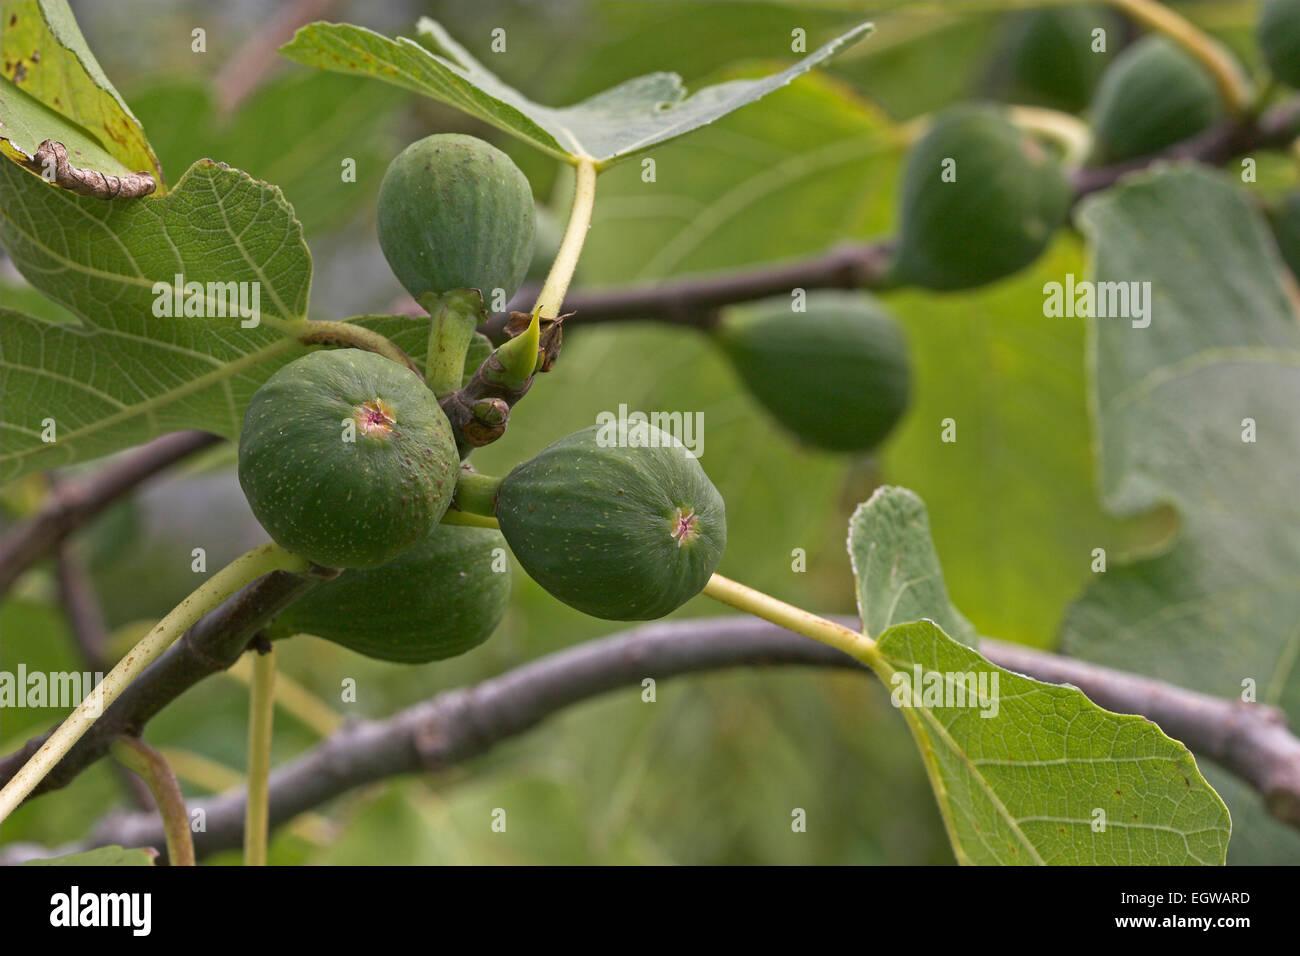 Fig, fruit, Echte Feige, Feigenbaum, Frucht, Früchte, Ficus carica Stock Photo